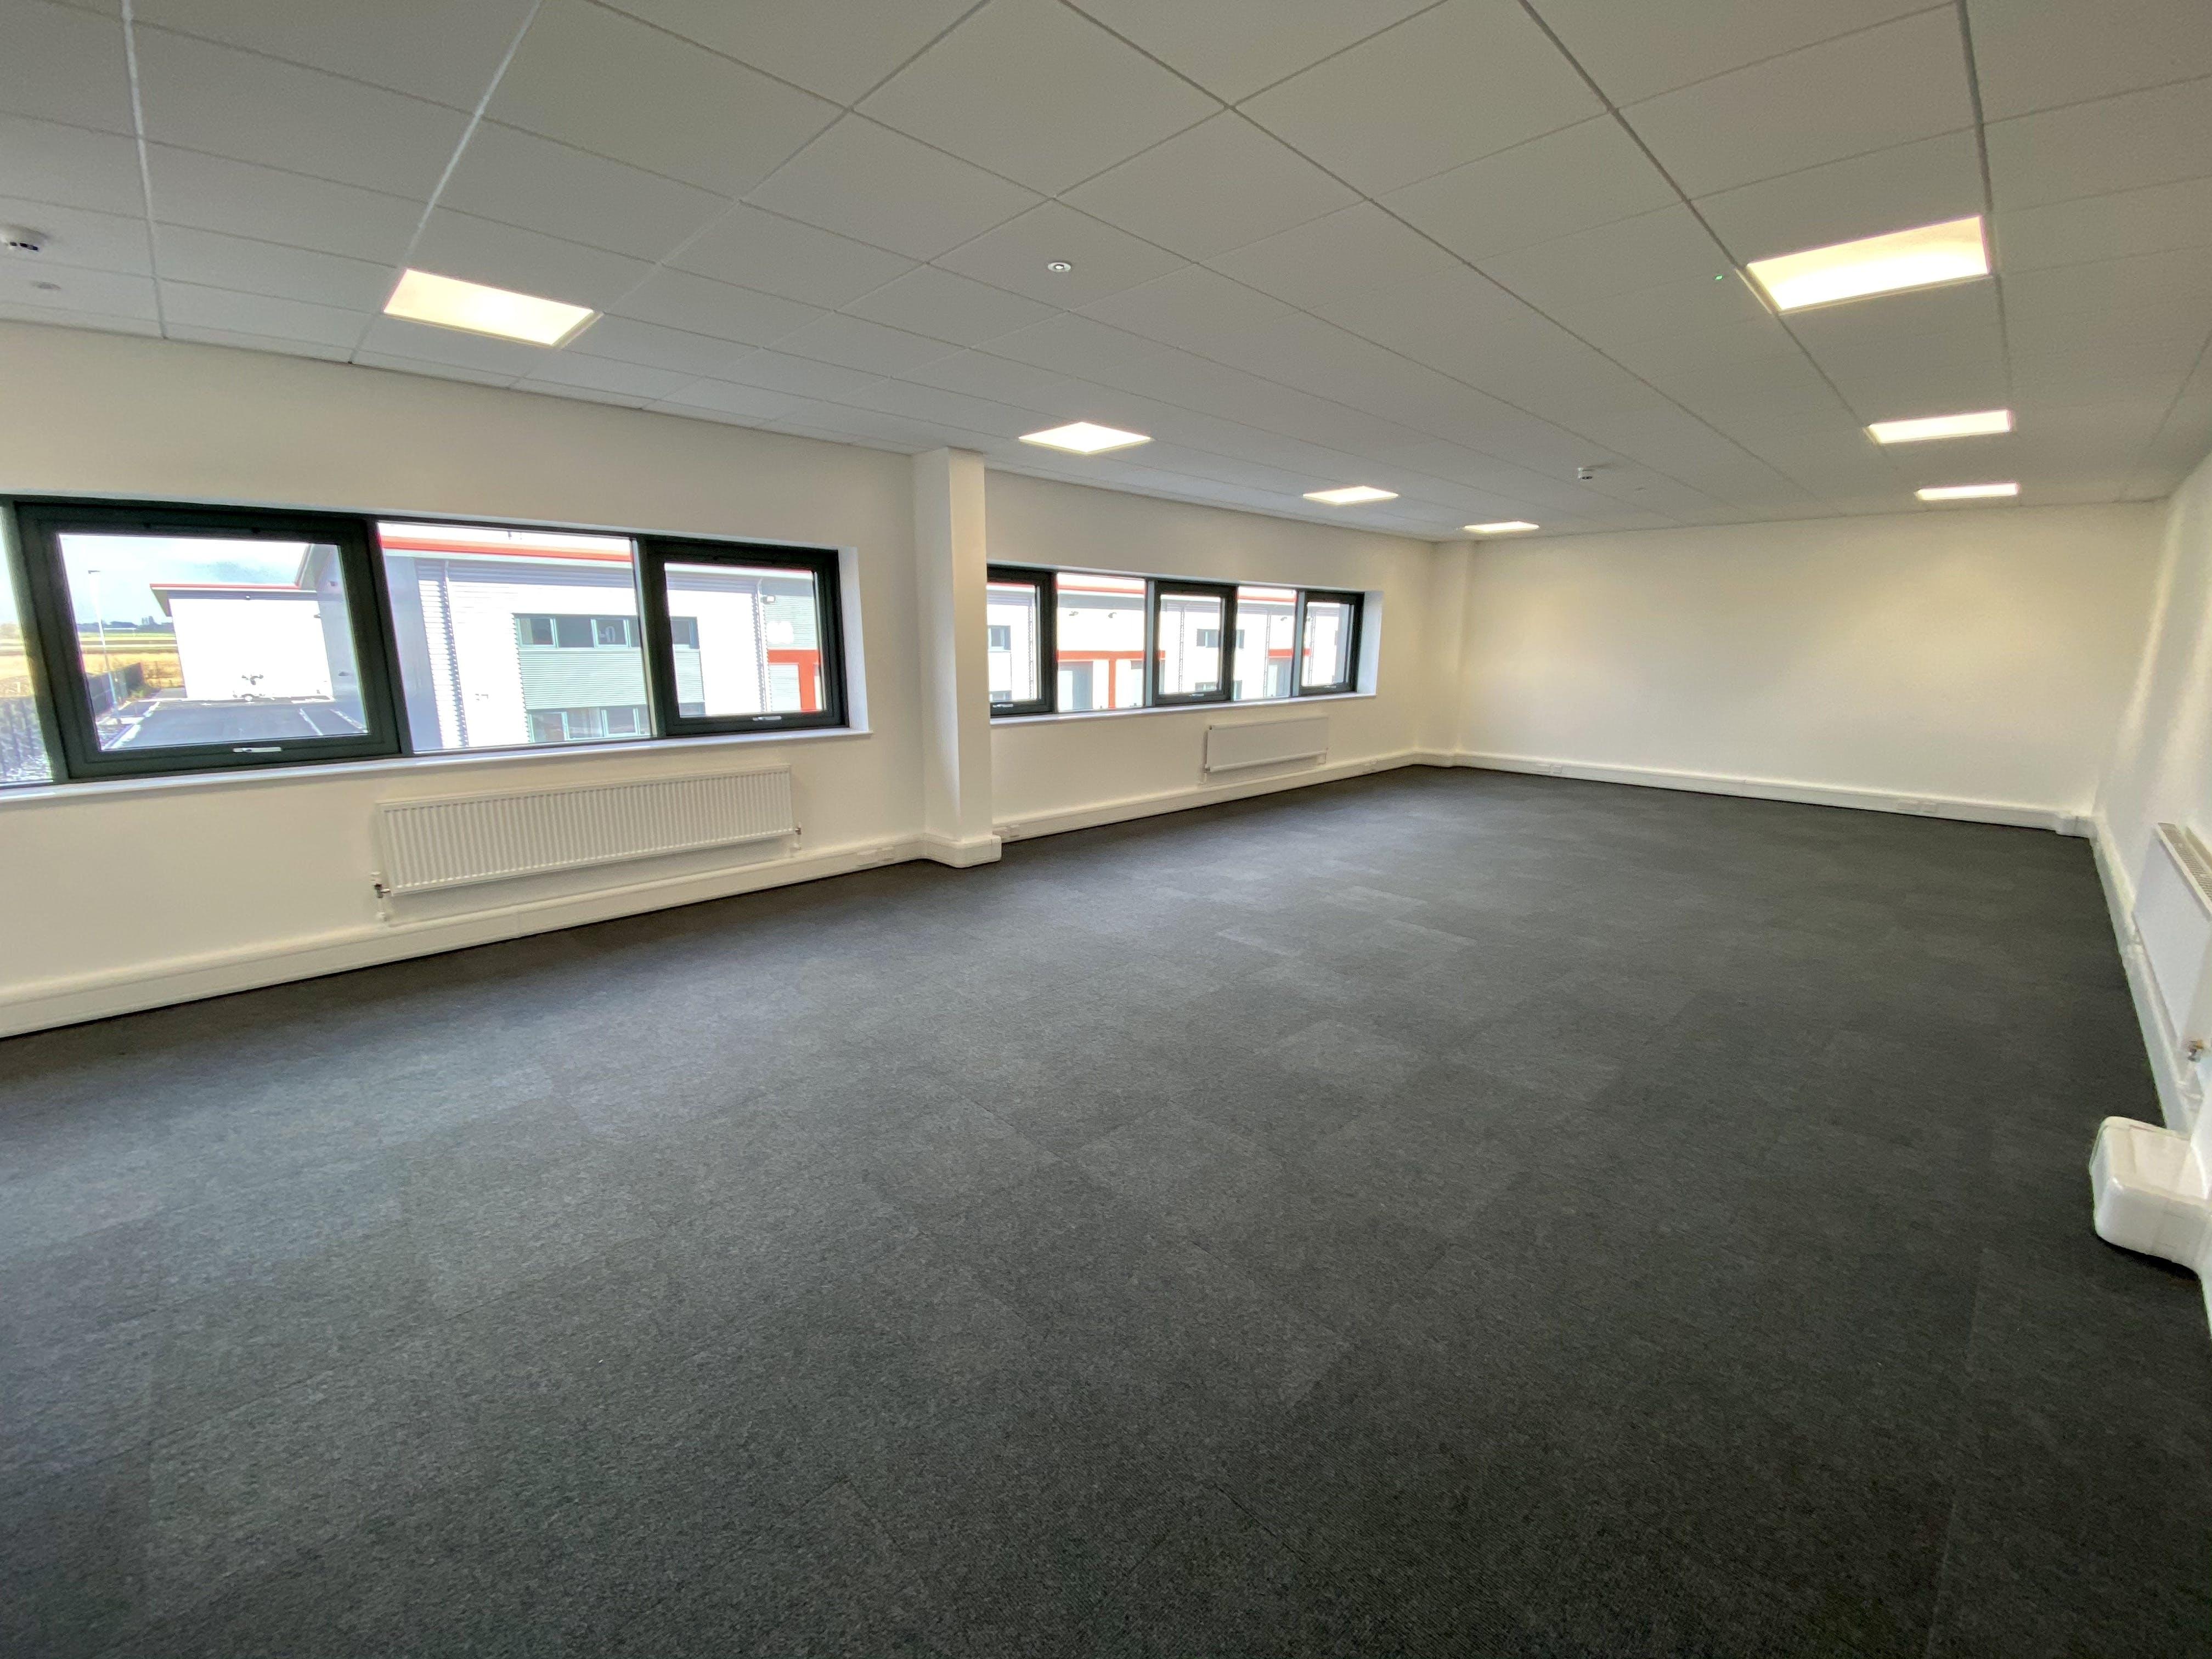 Unit 4, Tavis House Business Centre, Haddenham, Industrial To Let - UNIT 4 OFFICE.JPG